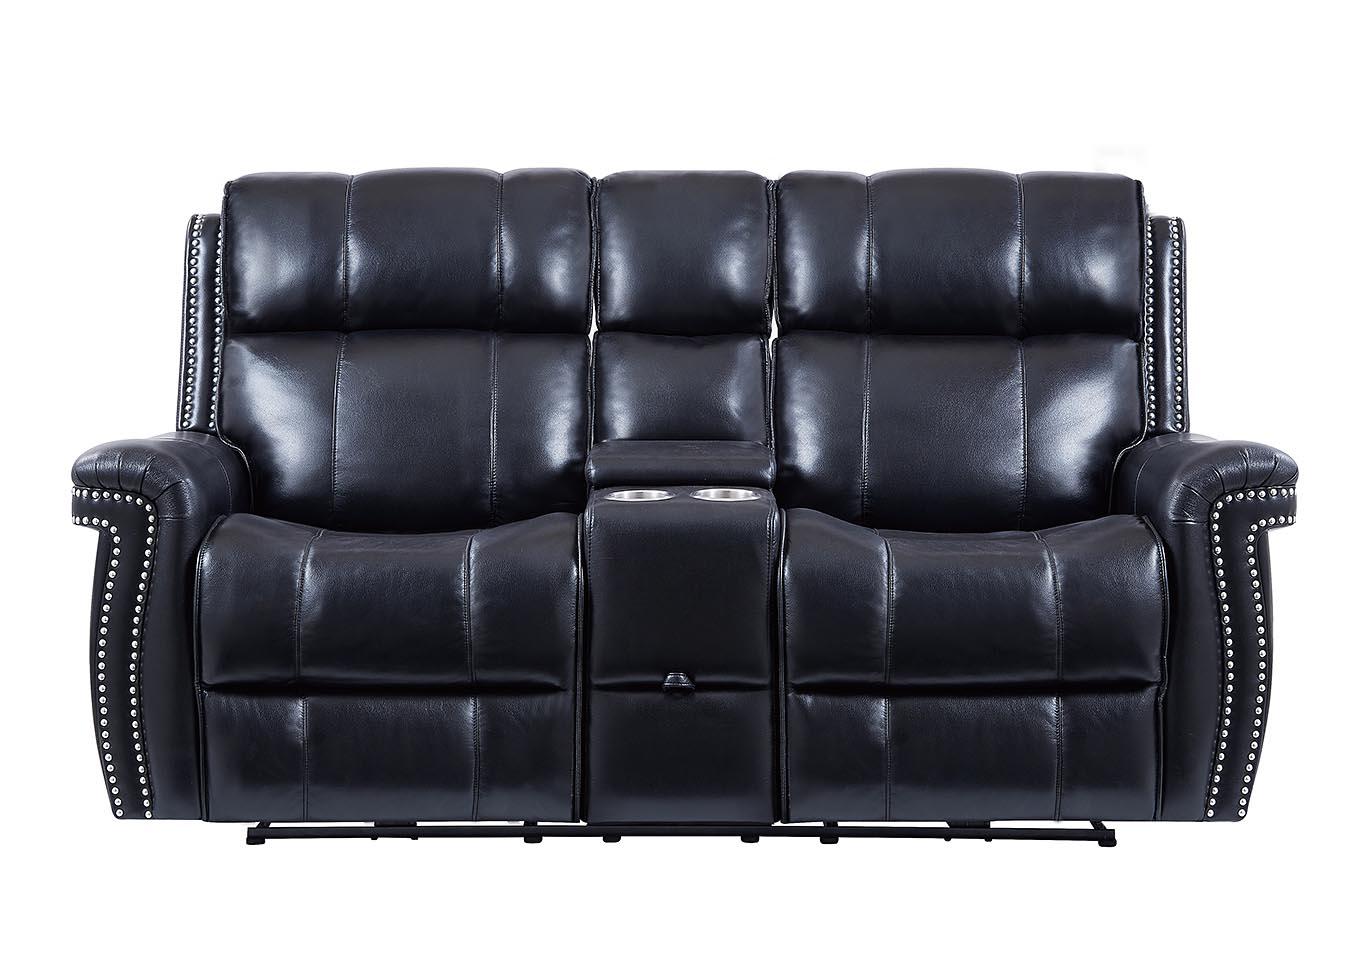 Overstock Furniture Langley Park Catonsville Alexandria Lanham